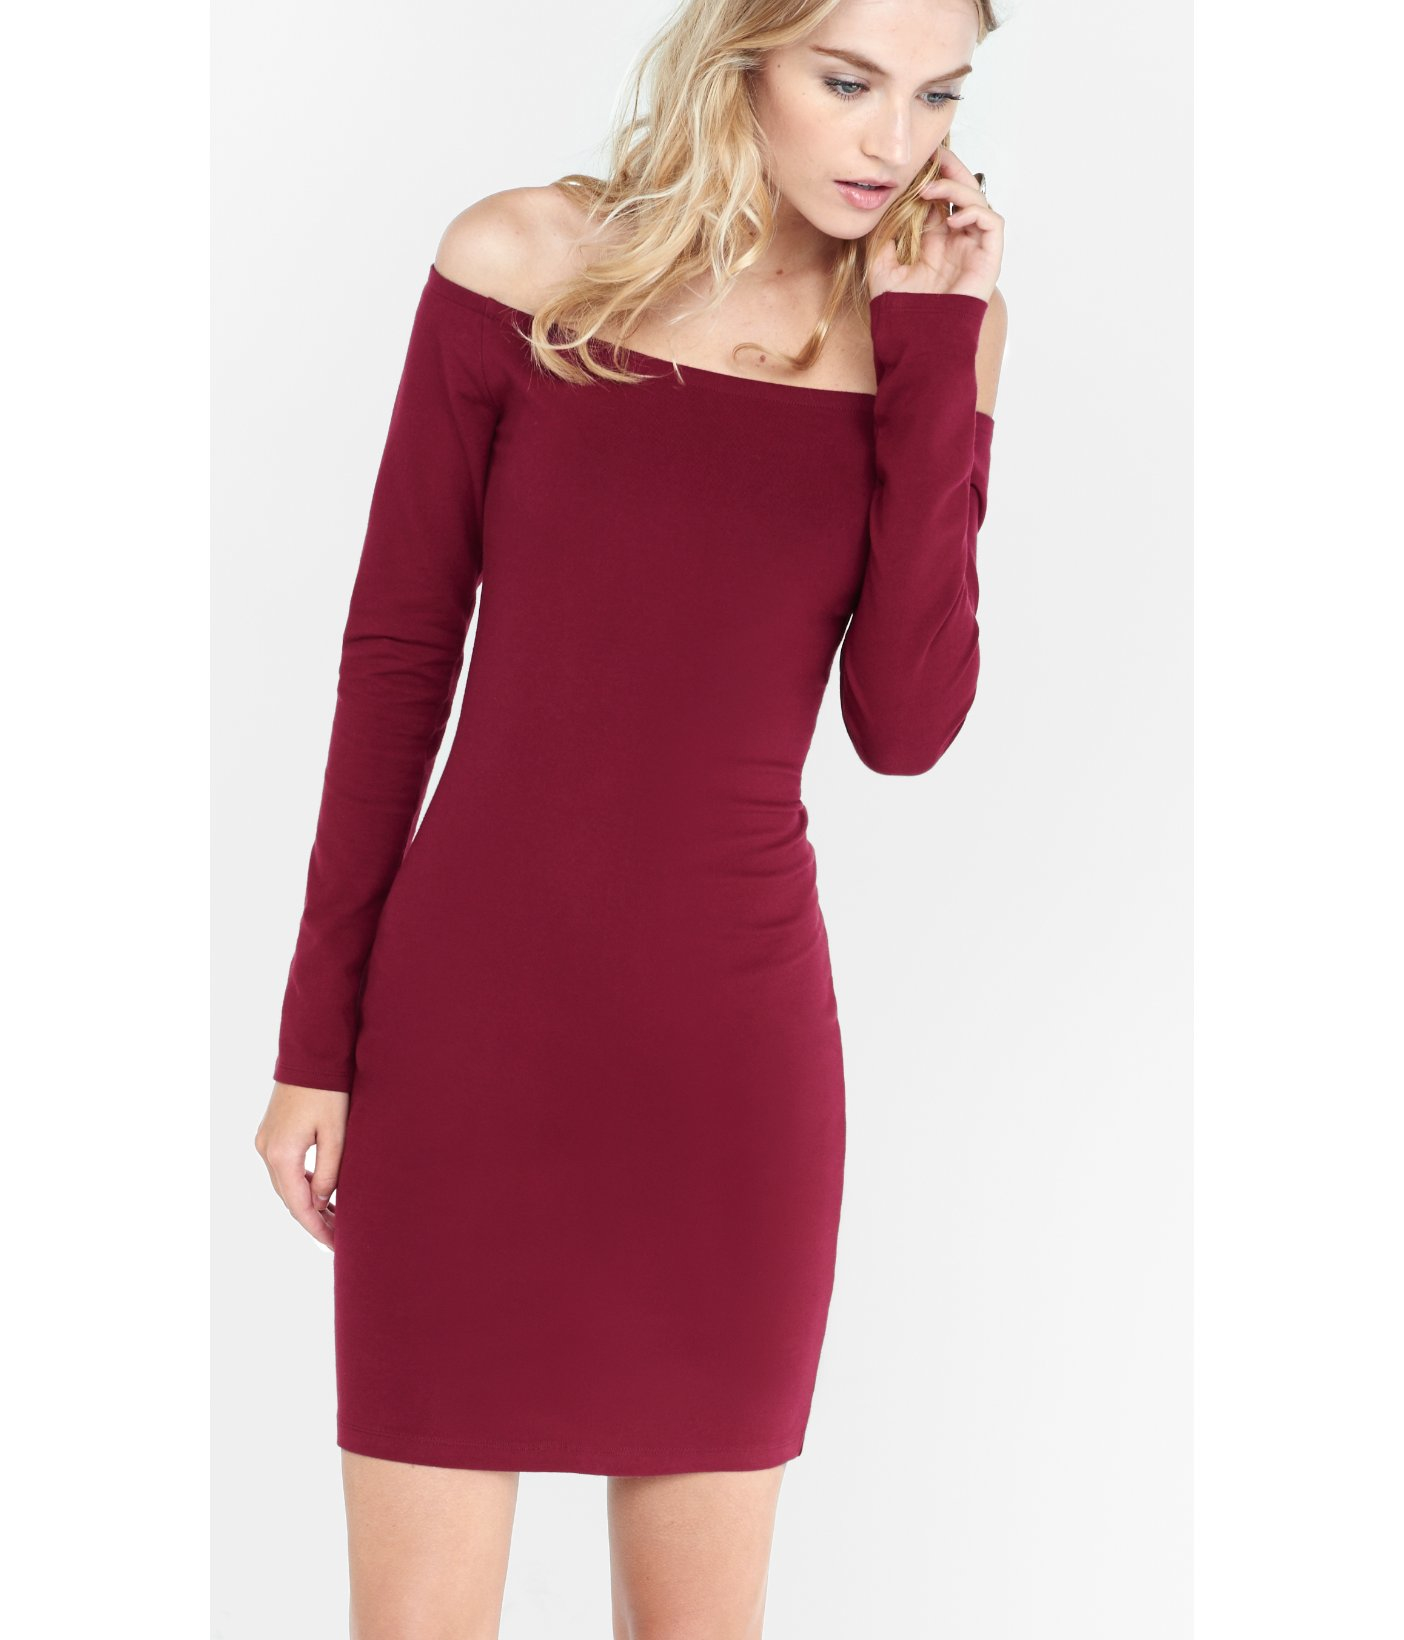 Purple Off the Shoulder Dress